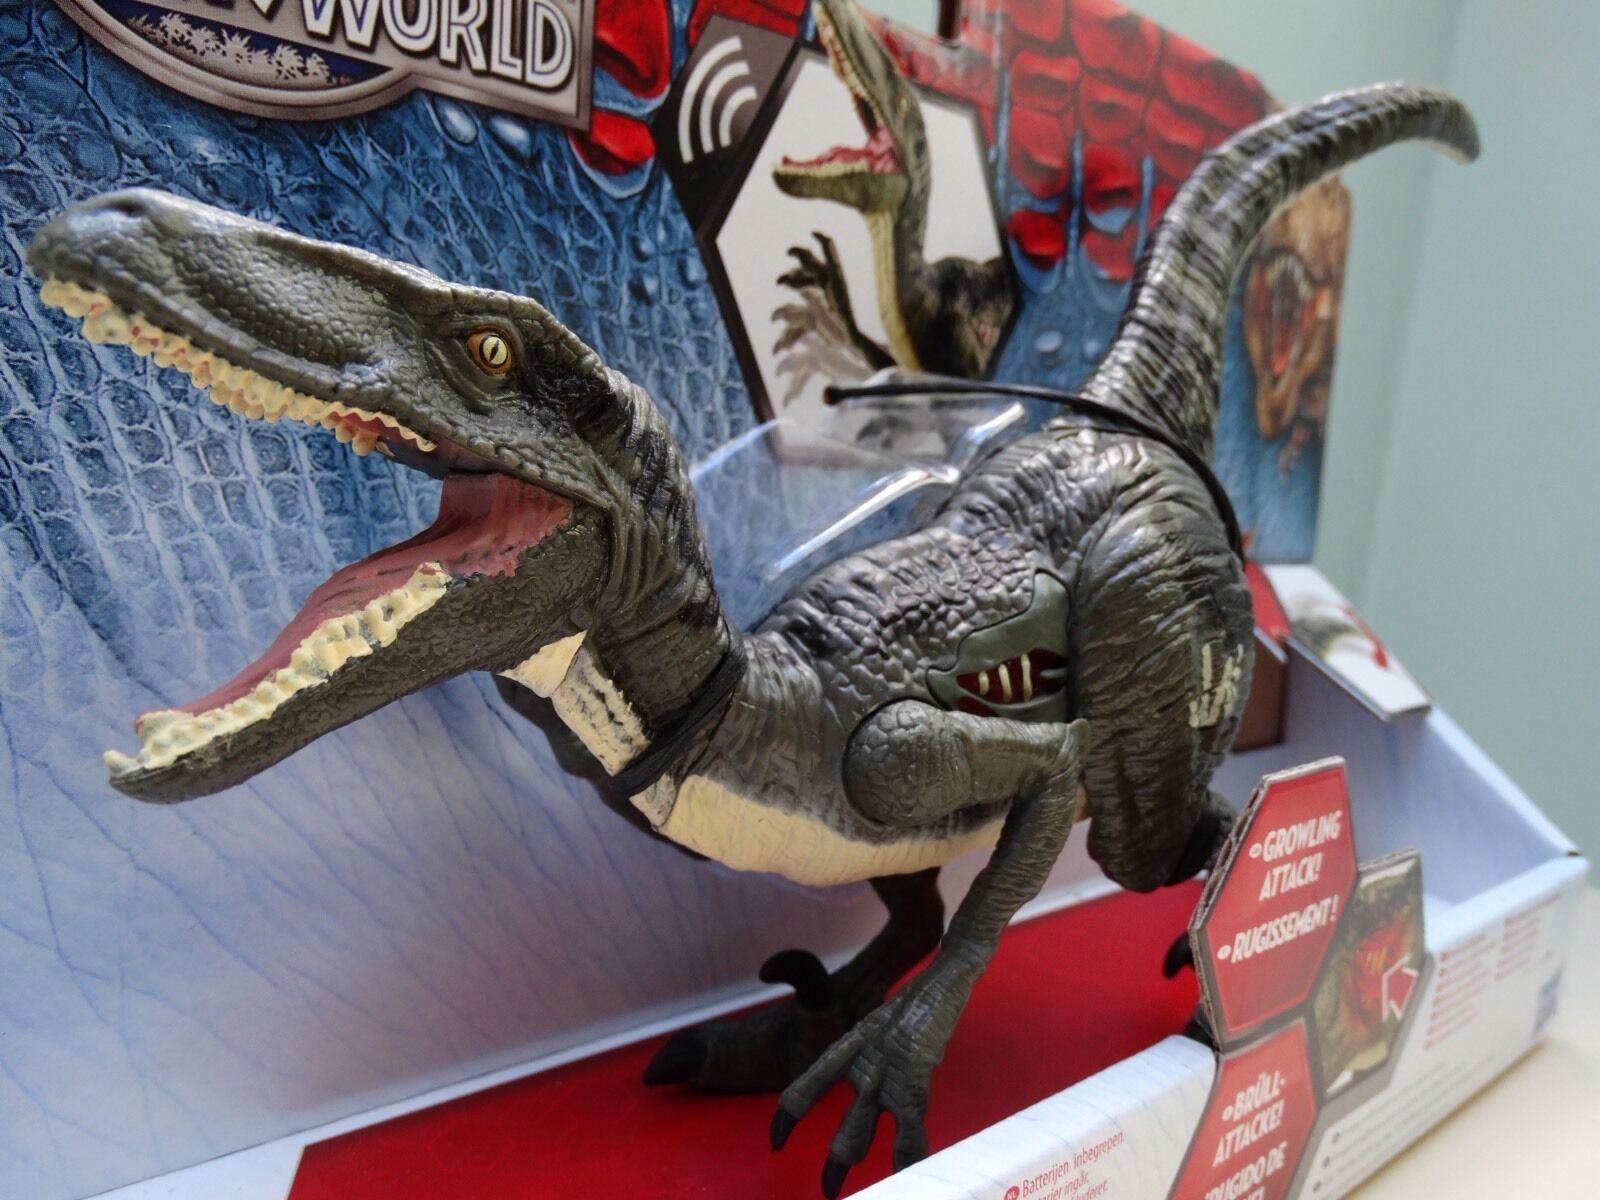 Jurassic welt blau velociraptor dinosaurier actionfigur park bnib growler klingt